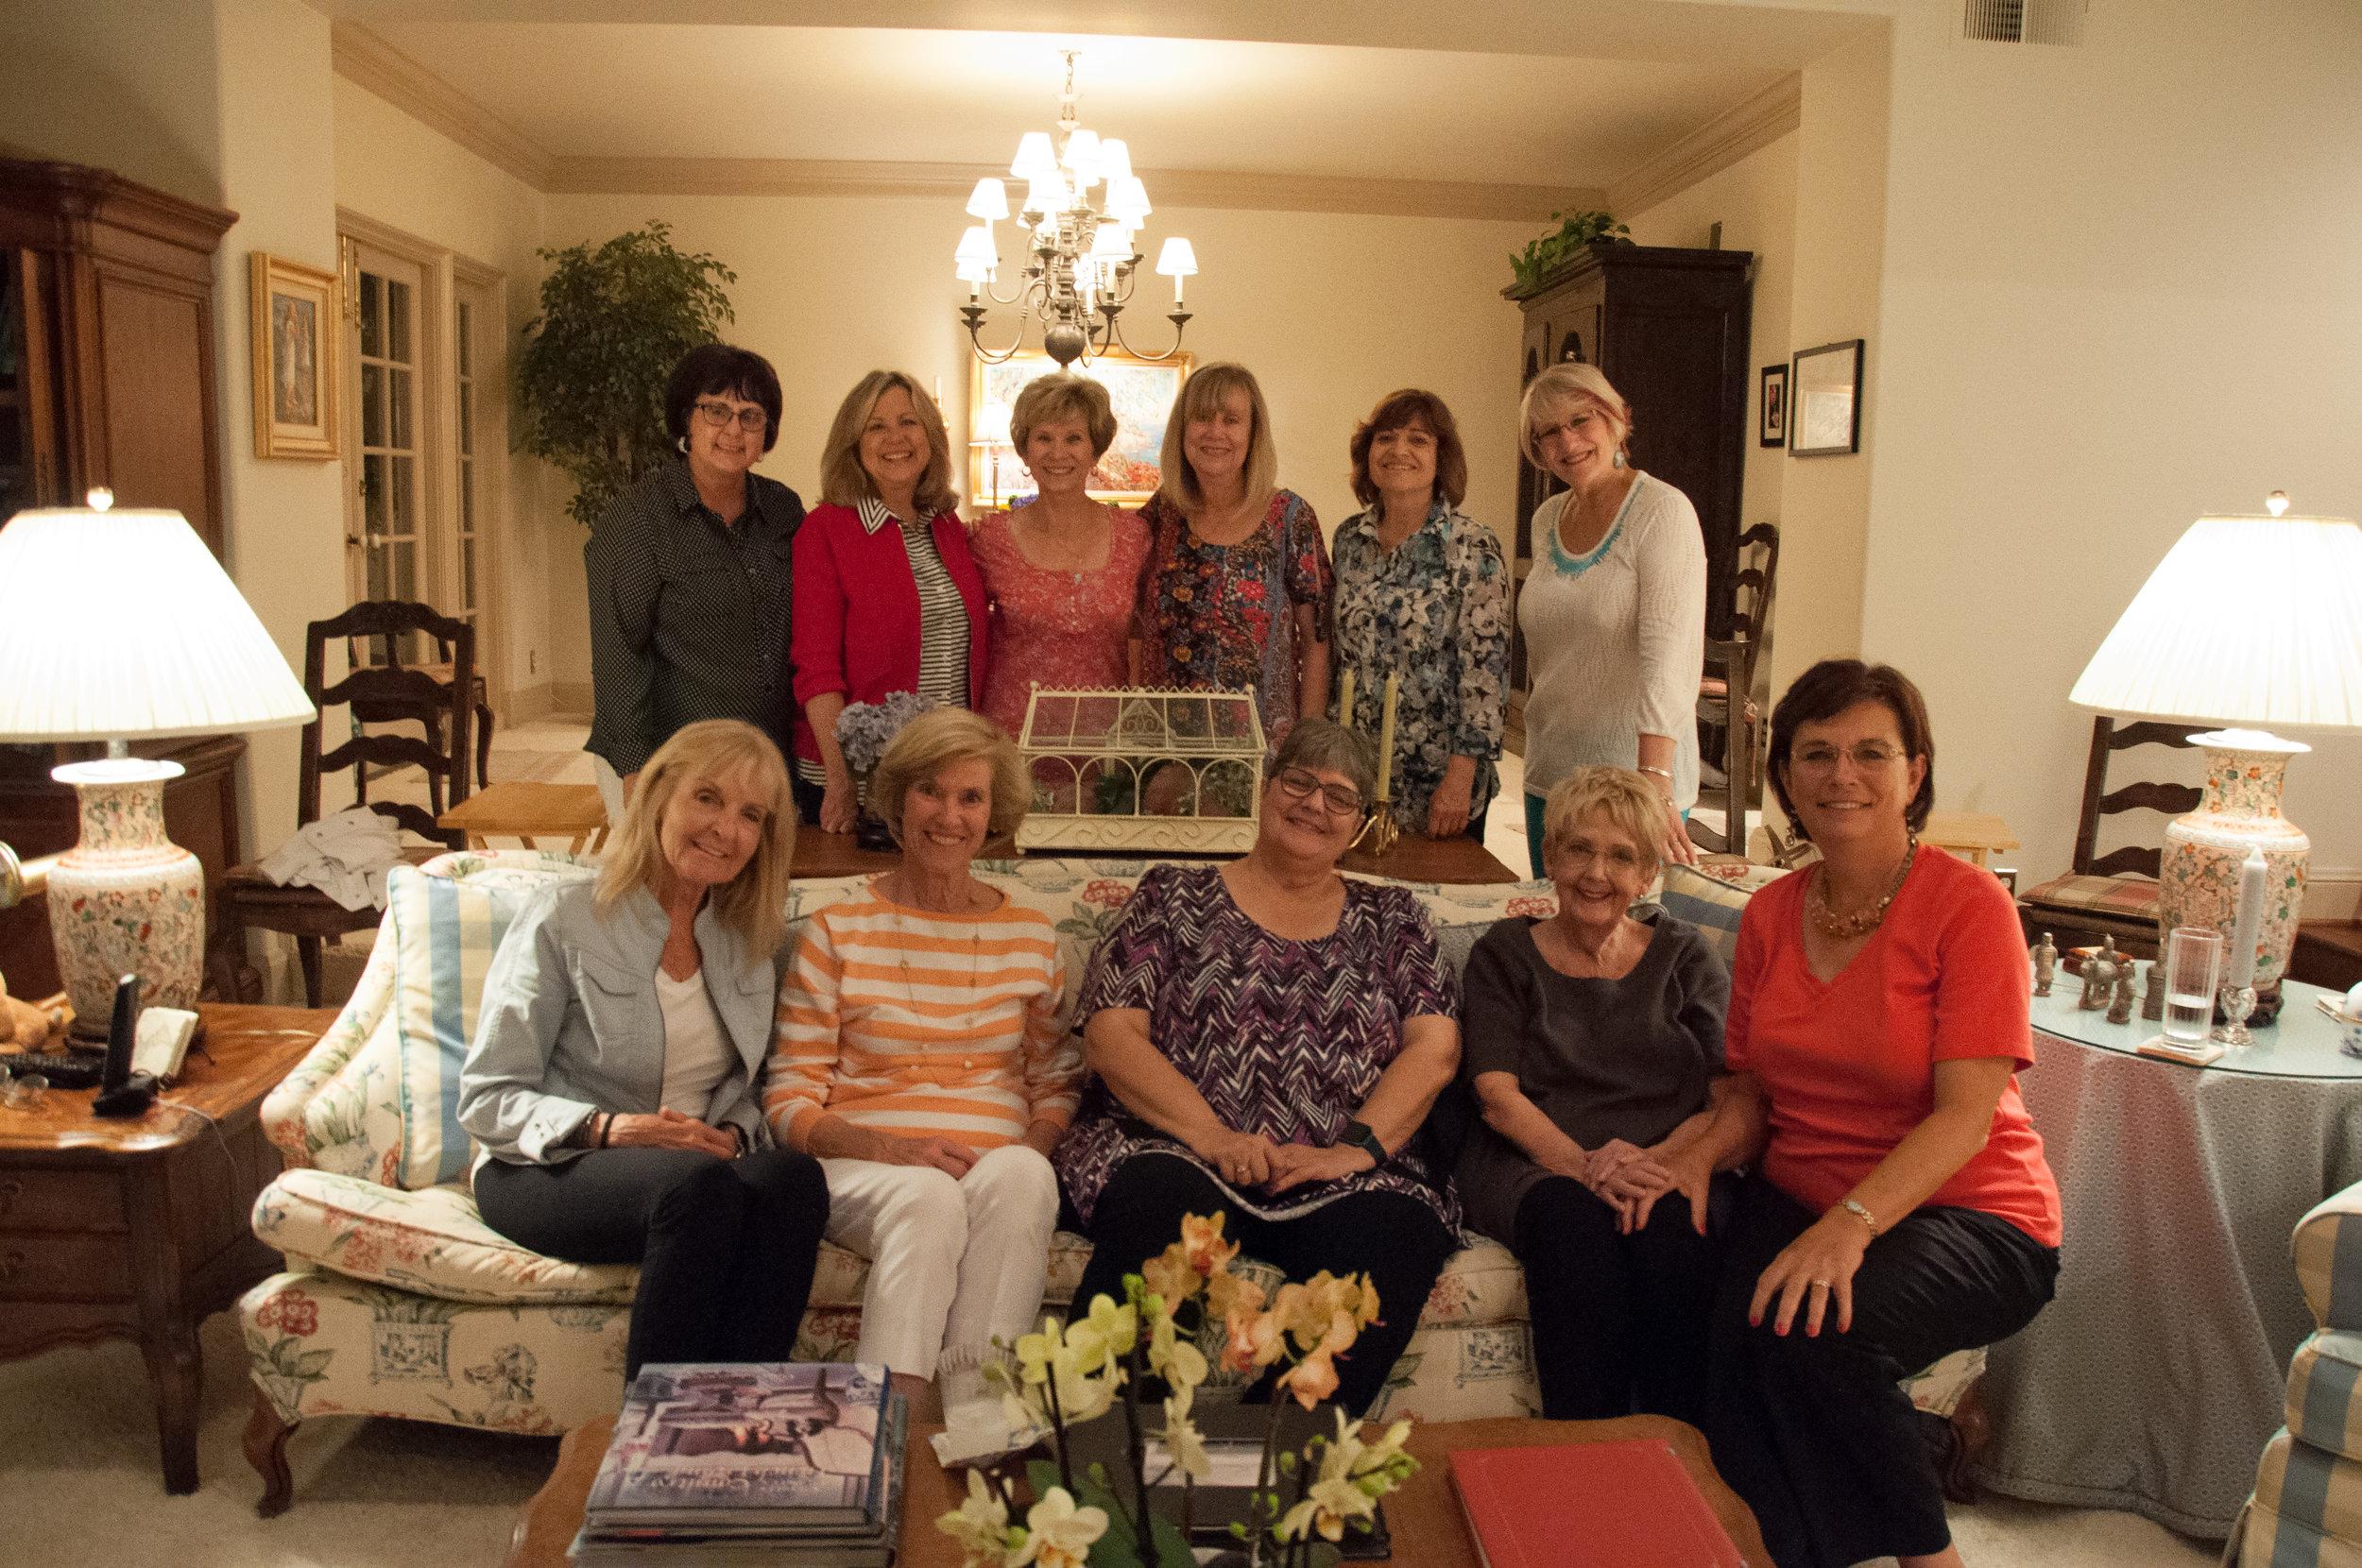 Jackie and Carolyn hosted the team for dinner. Back Row: Kim Johnson, Cheri Dale, Jill Austin, Marty Russell, Maureen Moore, Susan Booker. Front Row: Barbara Willett, Carolyn Shea, She Brown, Jackie Rettberg, Luann Budd.